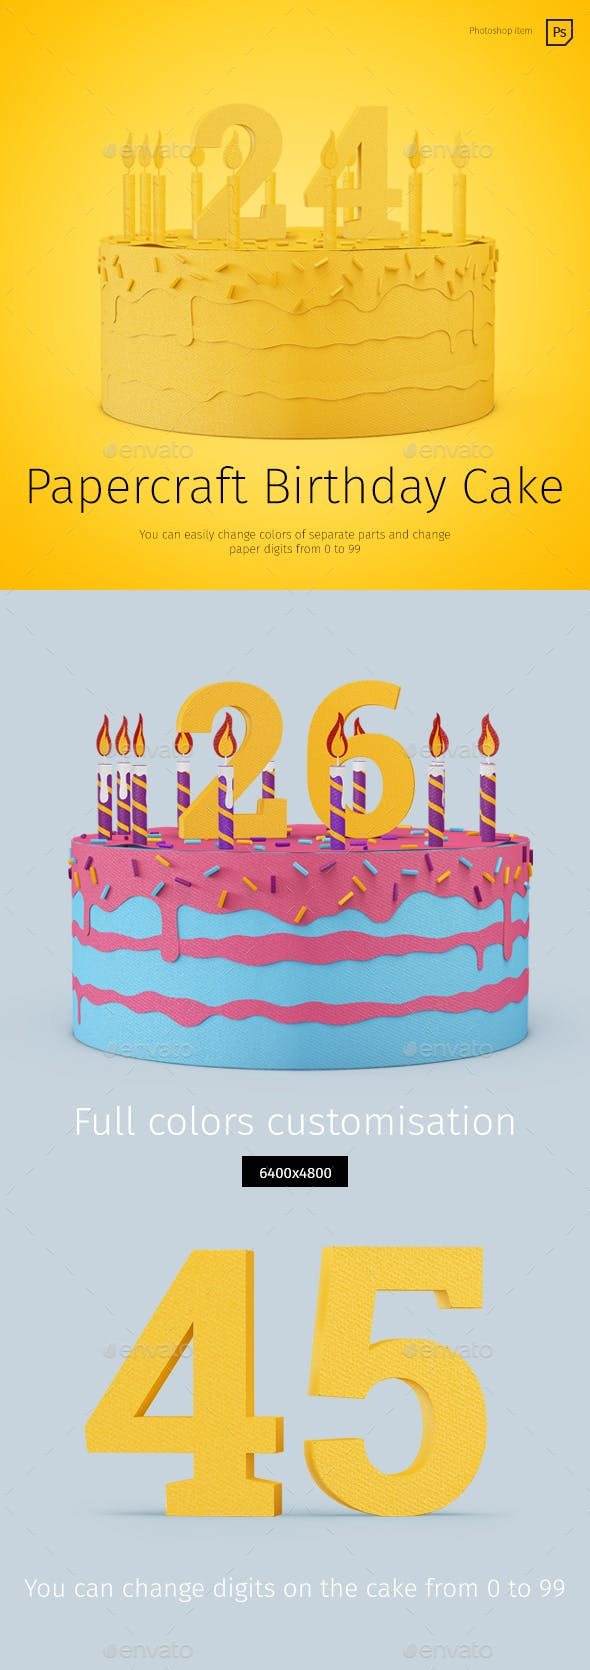 Papercraft Birthday Cake By TIT0